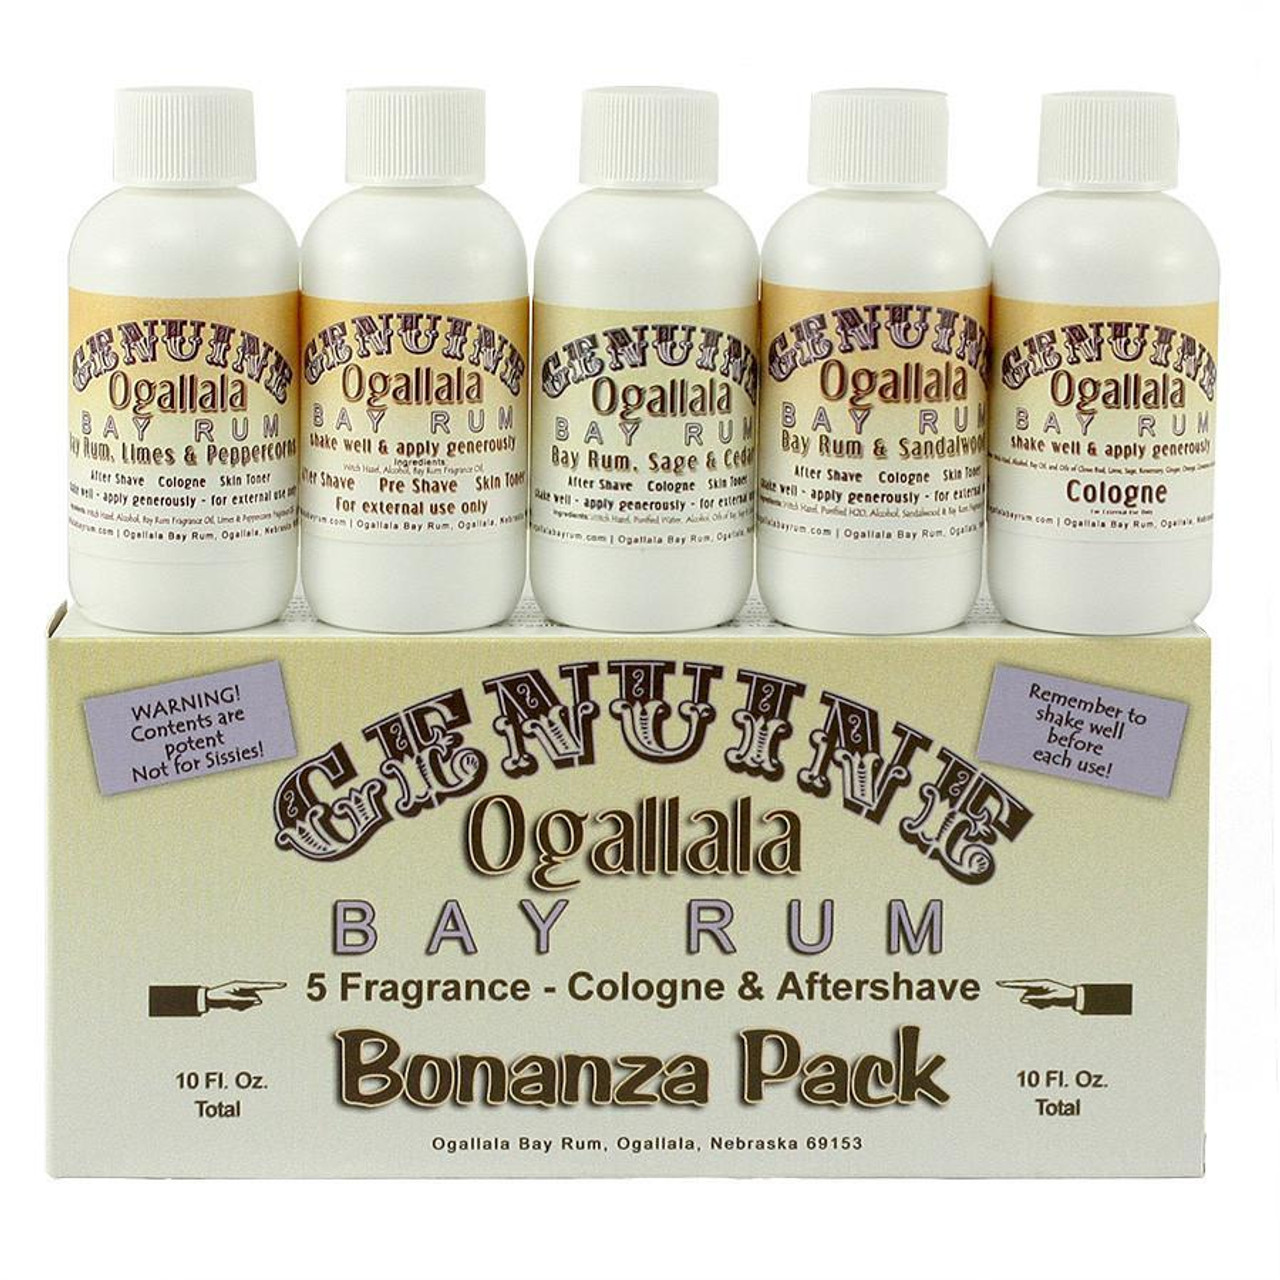 Ogallala Bonanza Pack